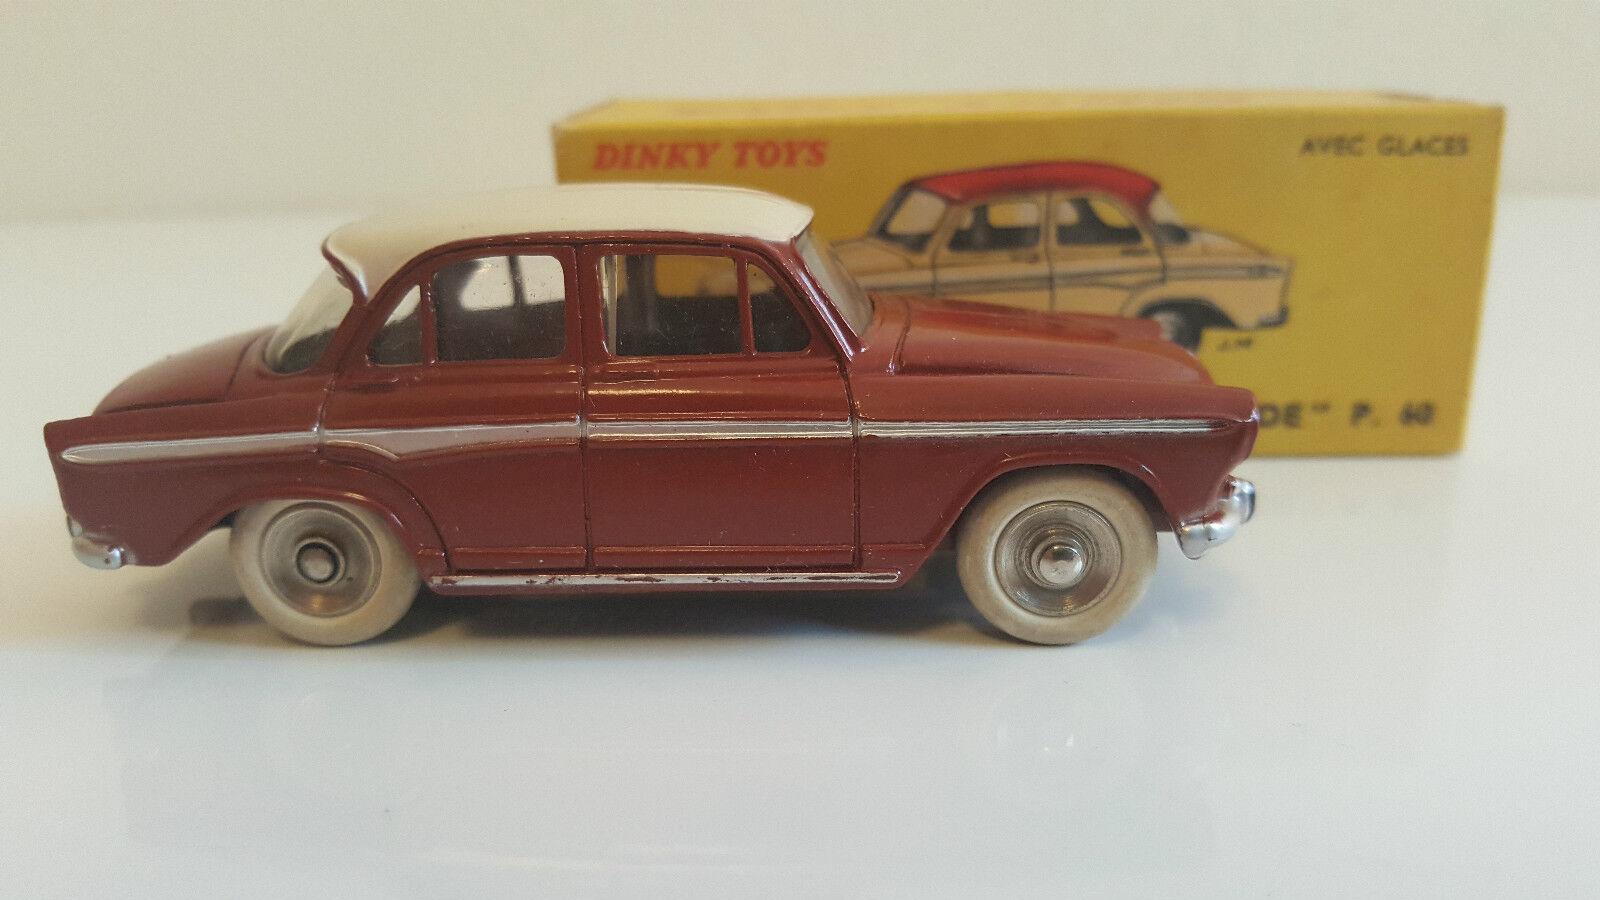 Dinky Toys - 544 - Simca Aronde P60 (Jantes concaves) en boîte d'origine VN Mib